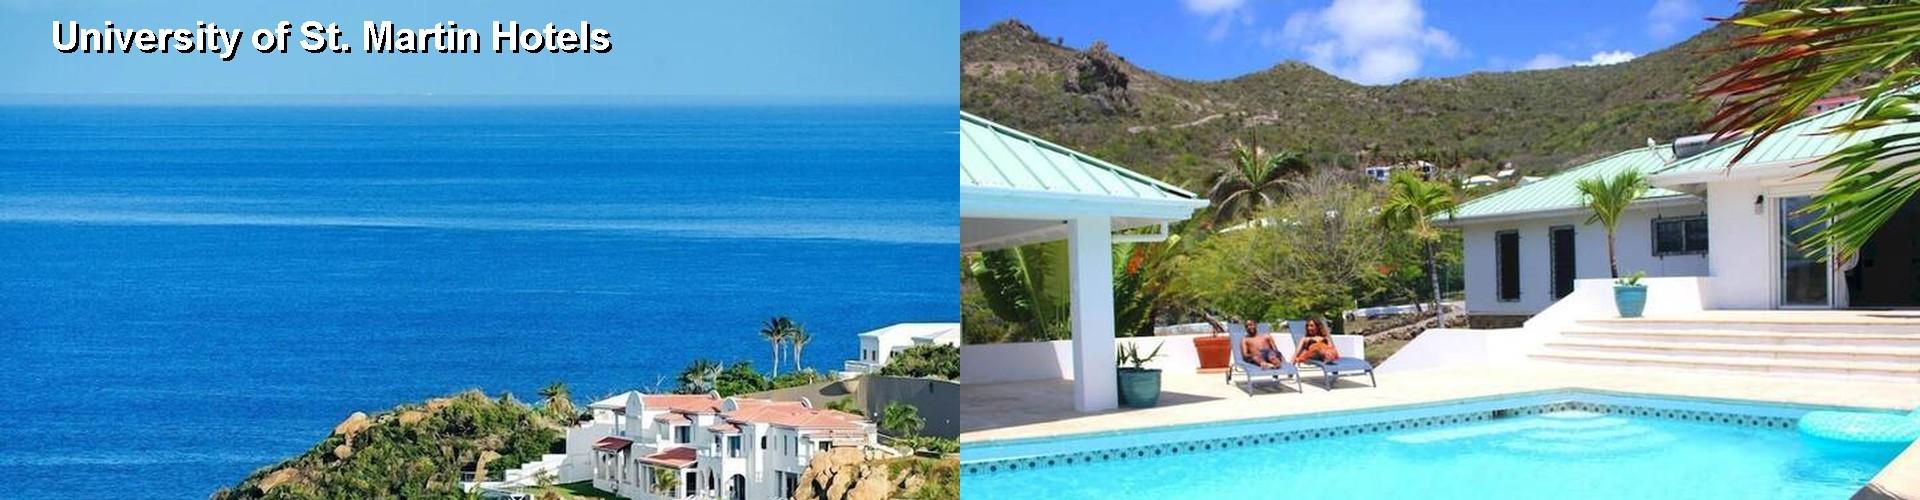 5 Best Hotels Near University Of St Martin